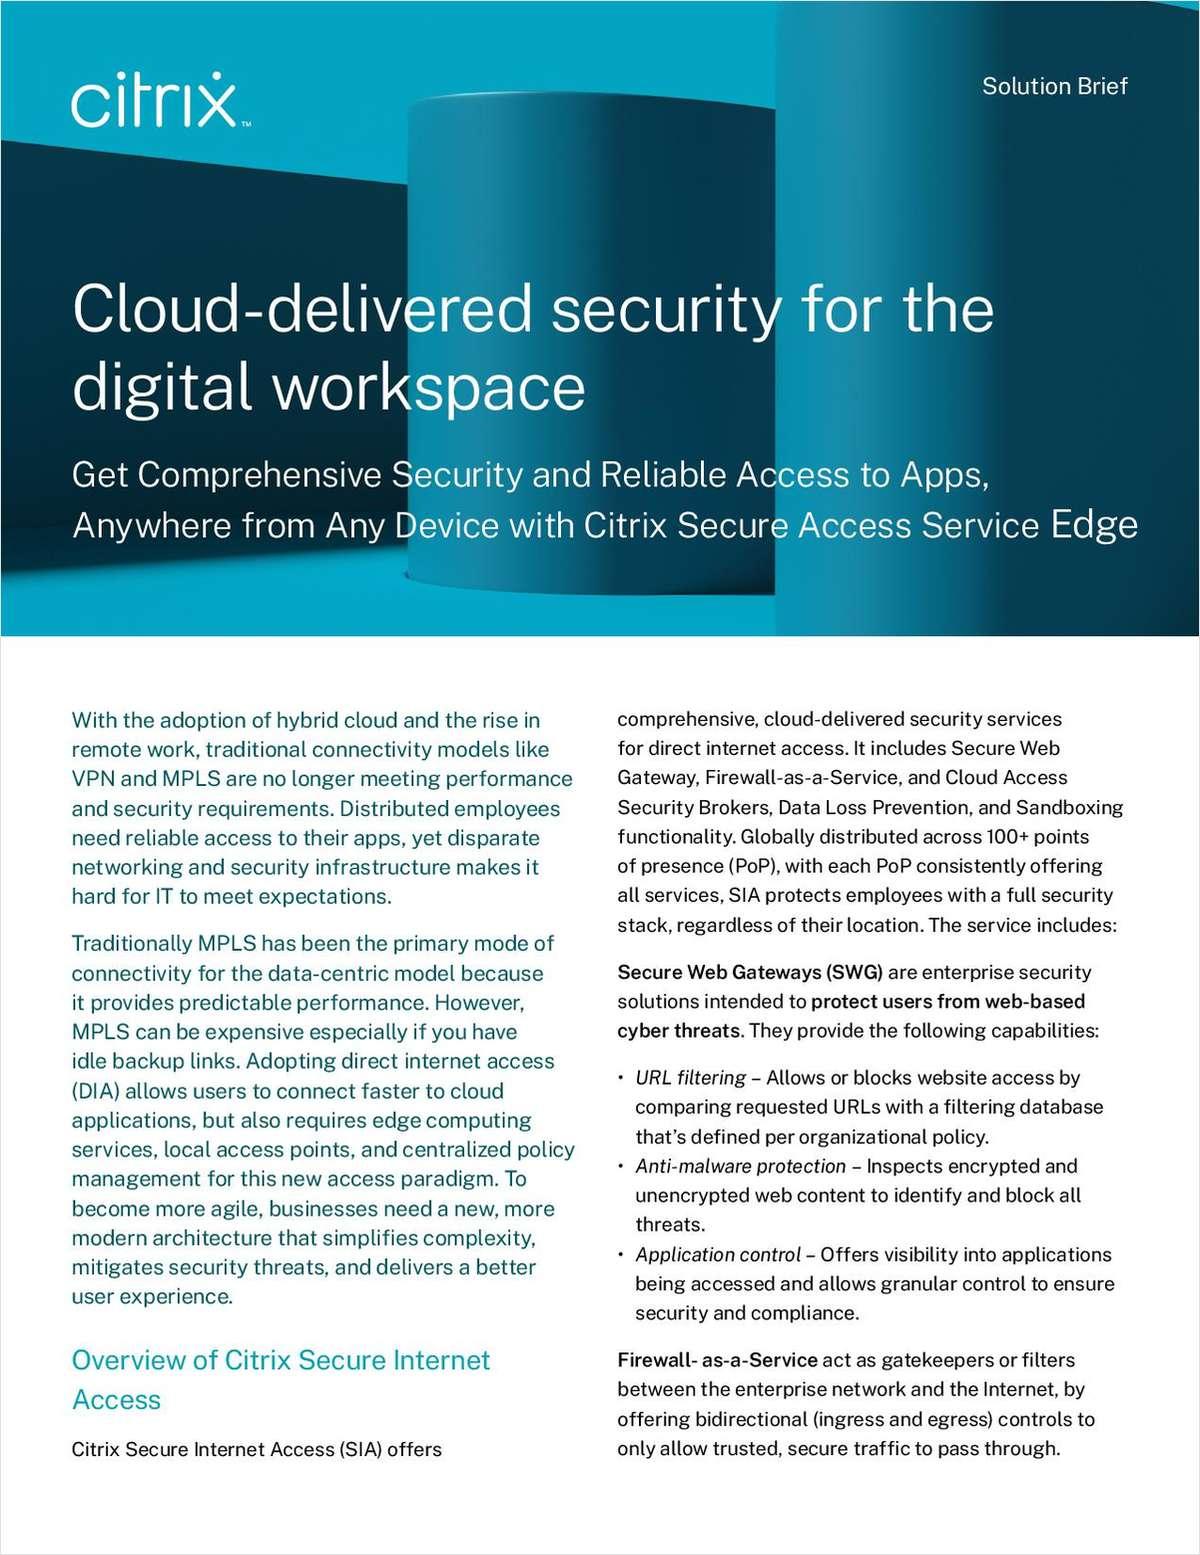 Secure Internet Access: Comprehensive, Cloud-delivered Security for the Digital Workspace